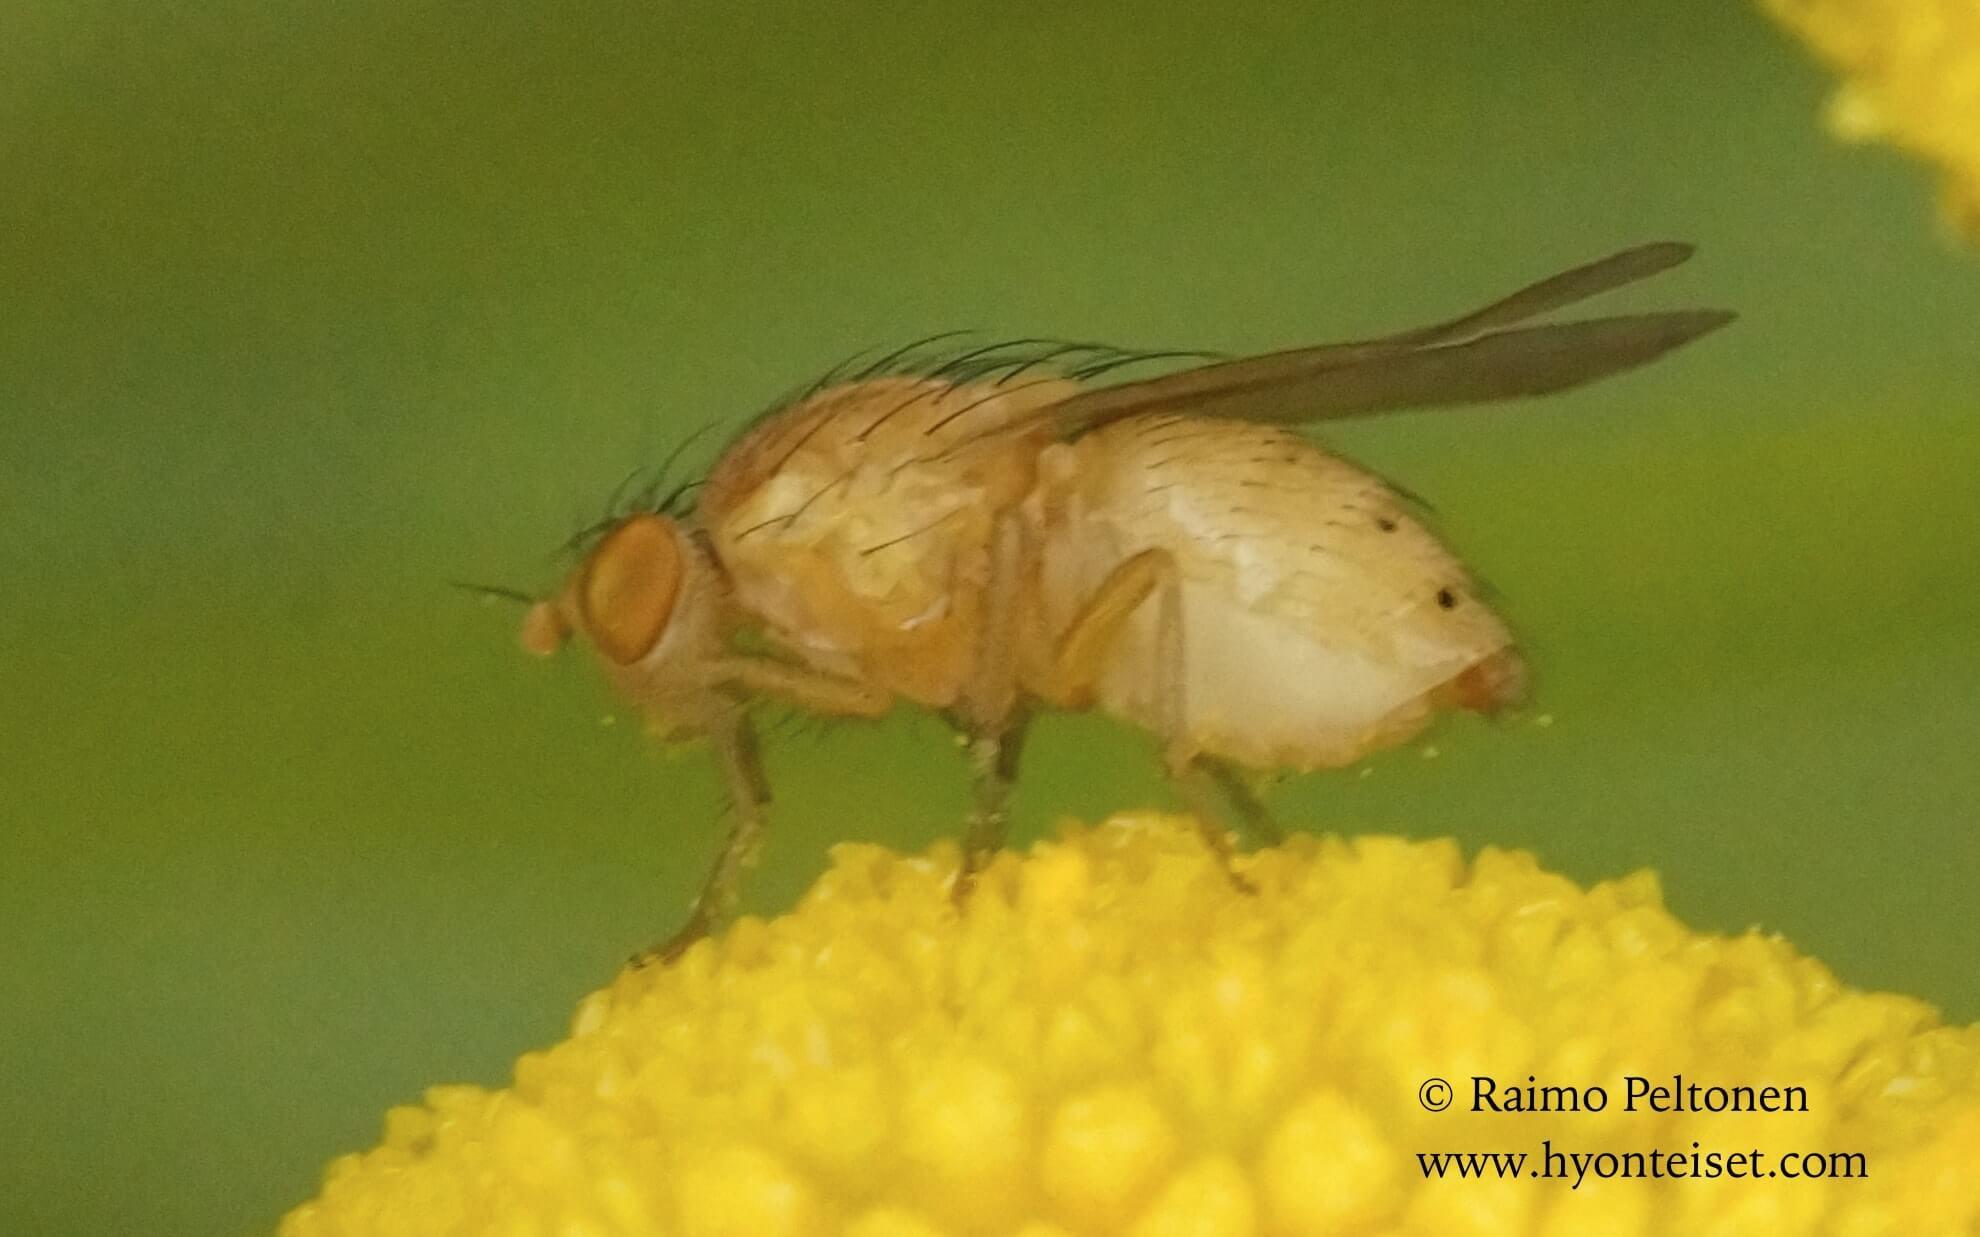 Sapromyzosoma cf. quadripunctata